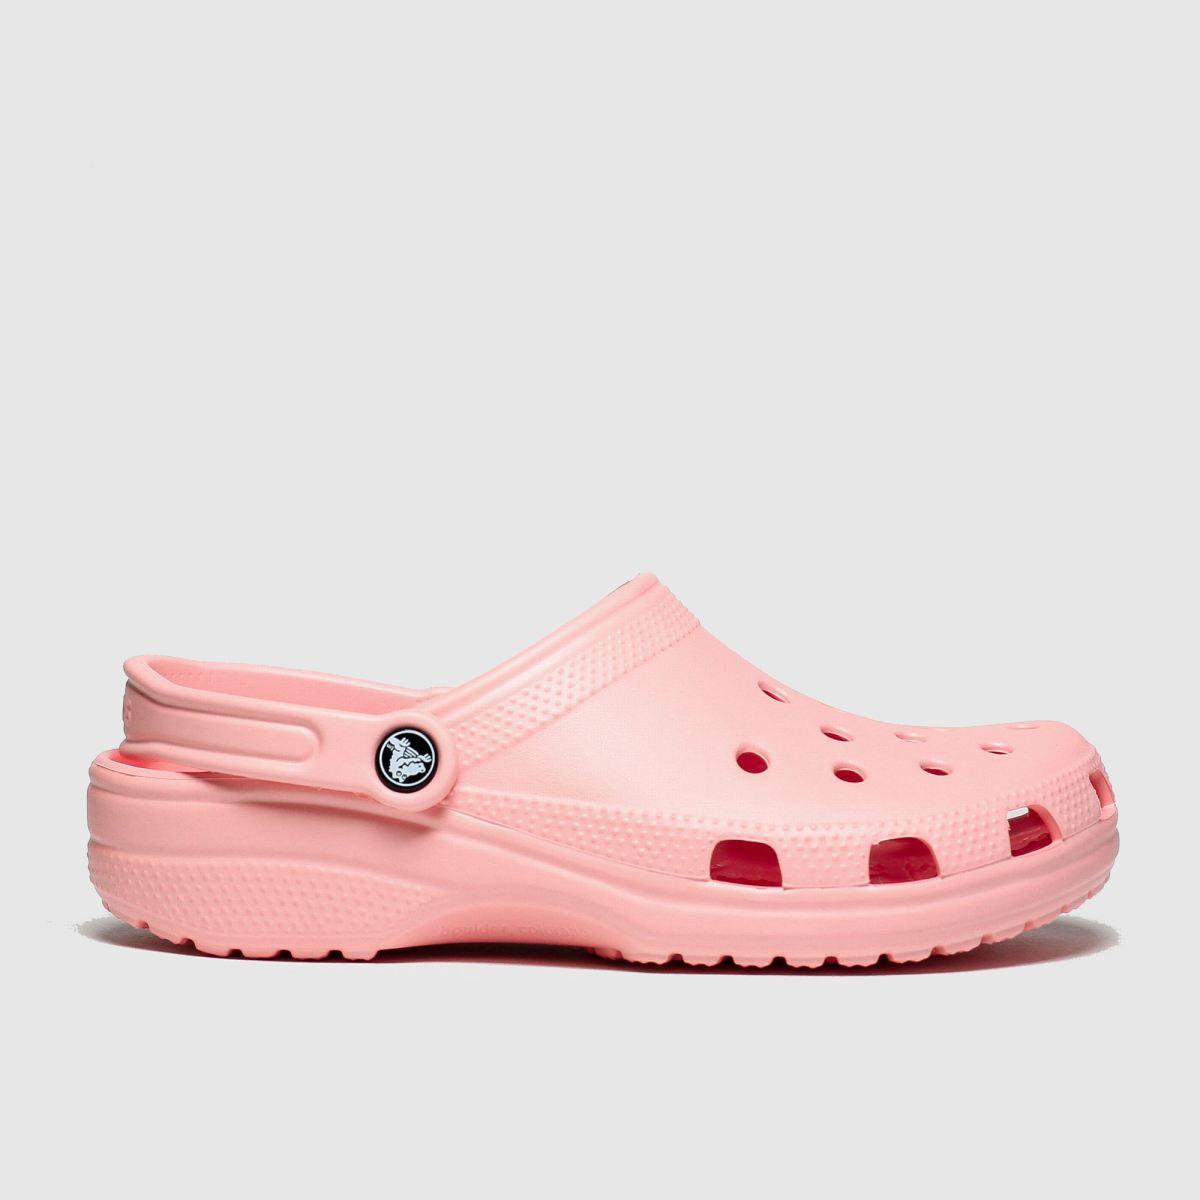 Crocs Pale Pink Classic Clog Sandals